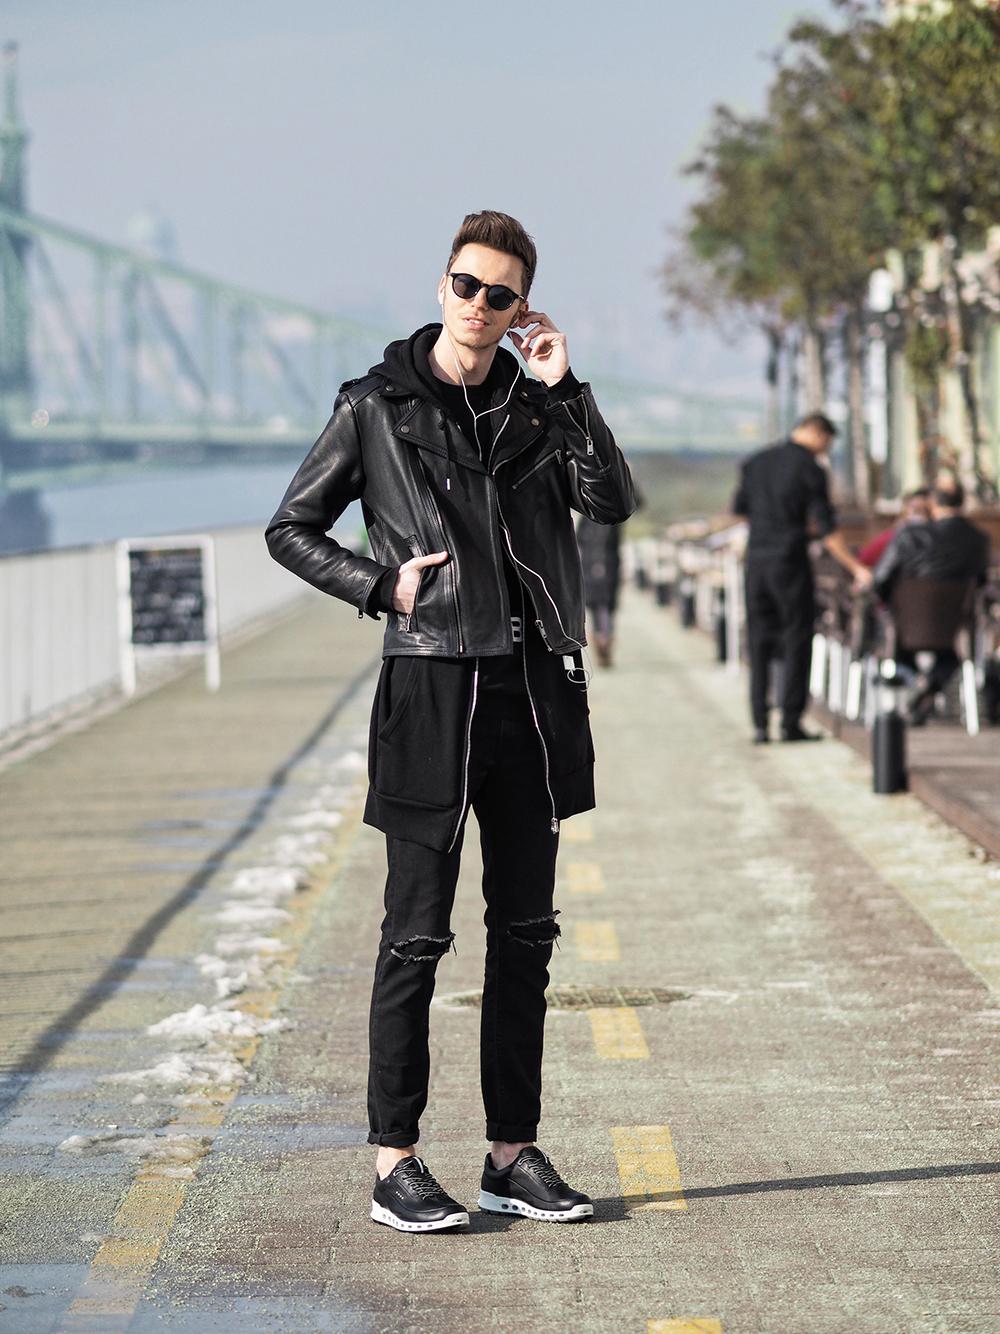 ecco-shoes-street-style-formen-men-sneakers-vizallo-fekete-sportcipo_5.jpg